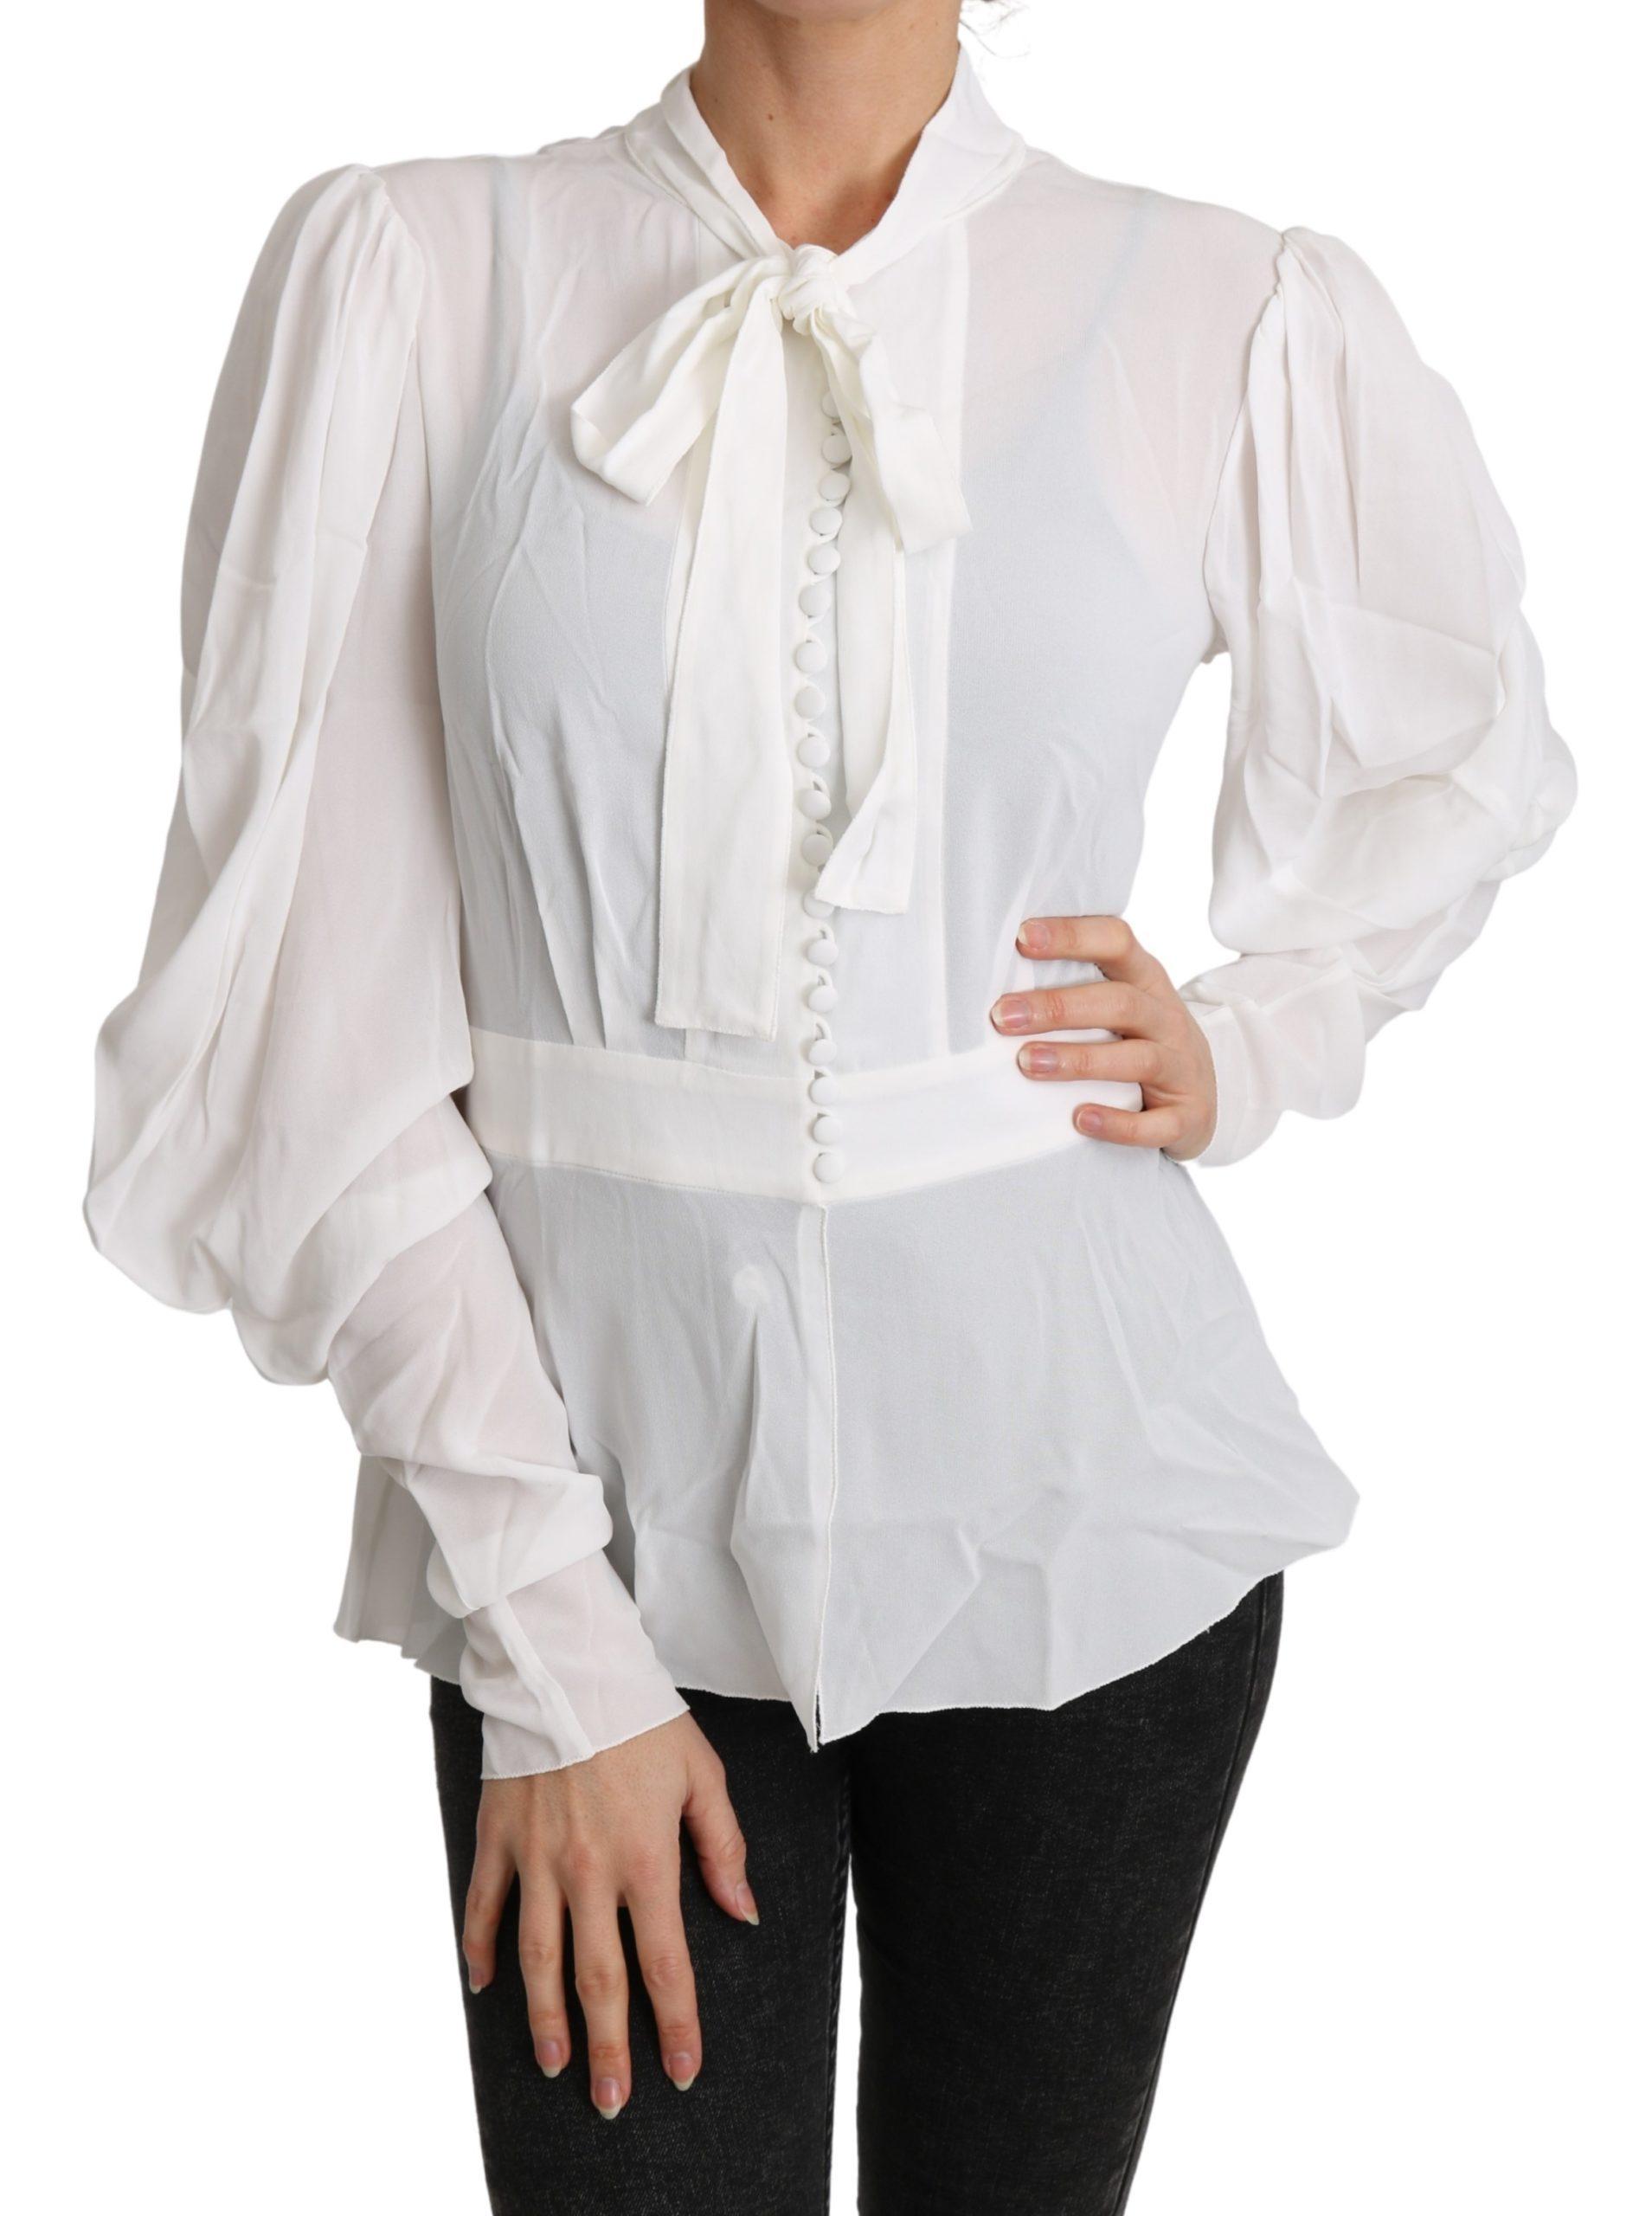 Dolce & Gabbana Women's Scarf Neck LS Top White TSH4829 - IT50|3XL